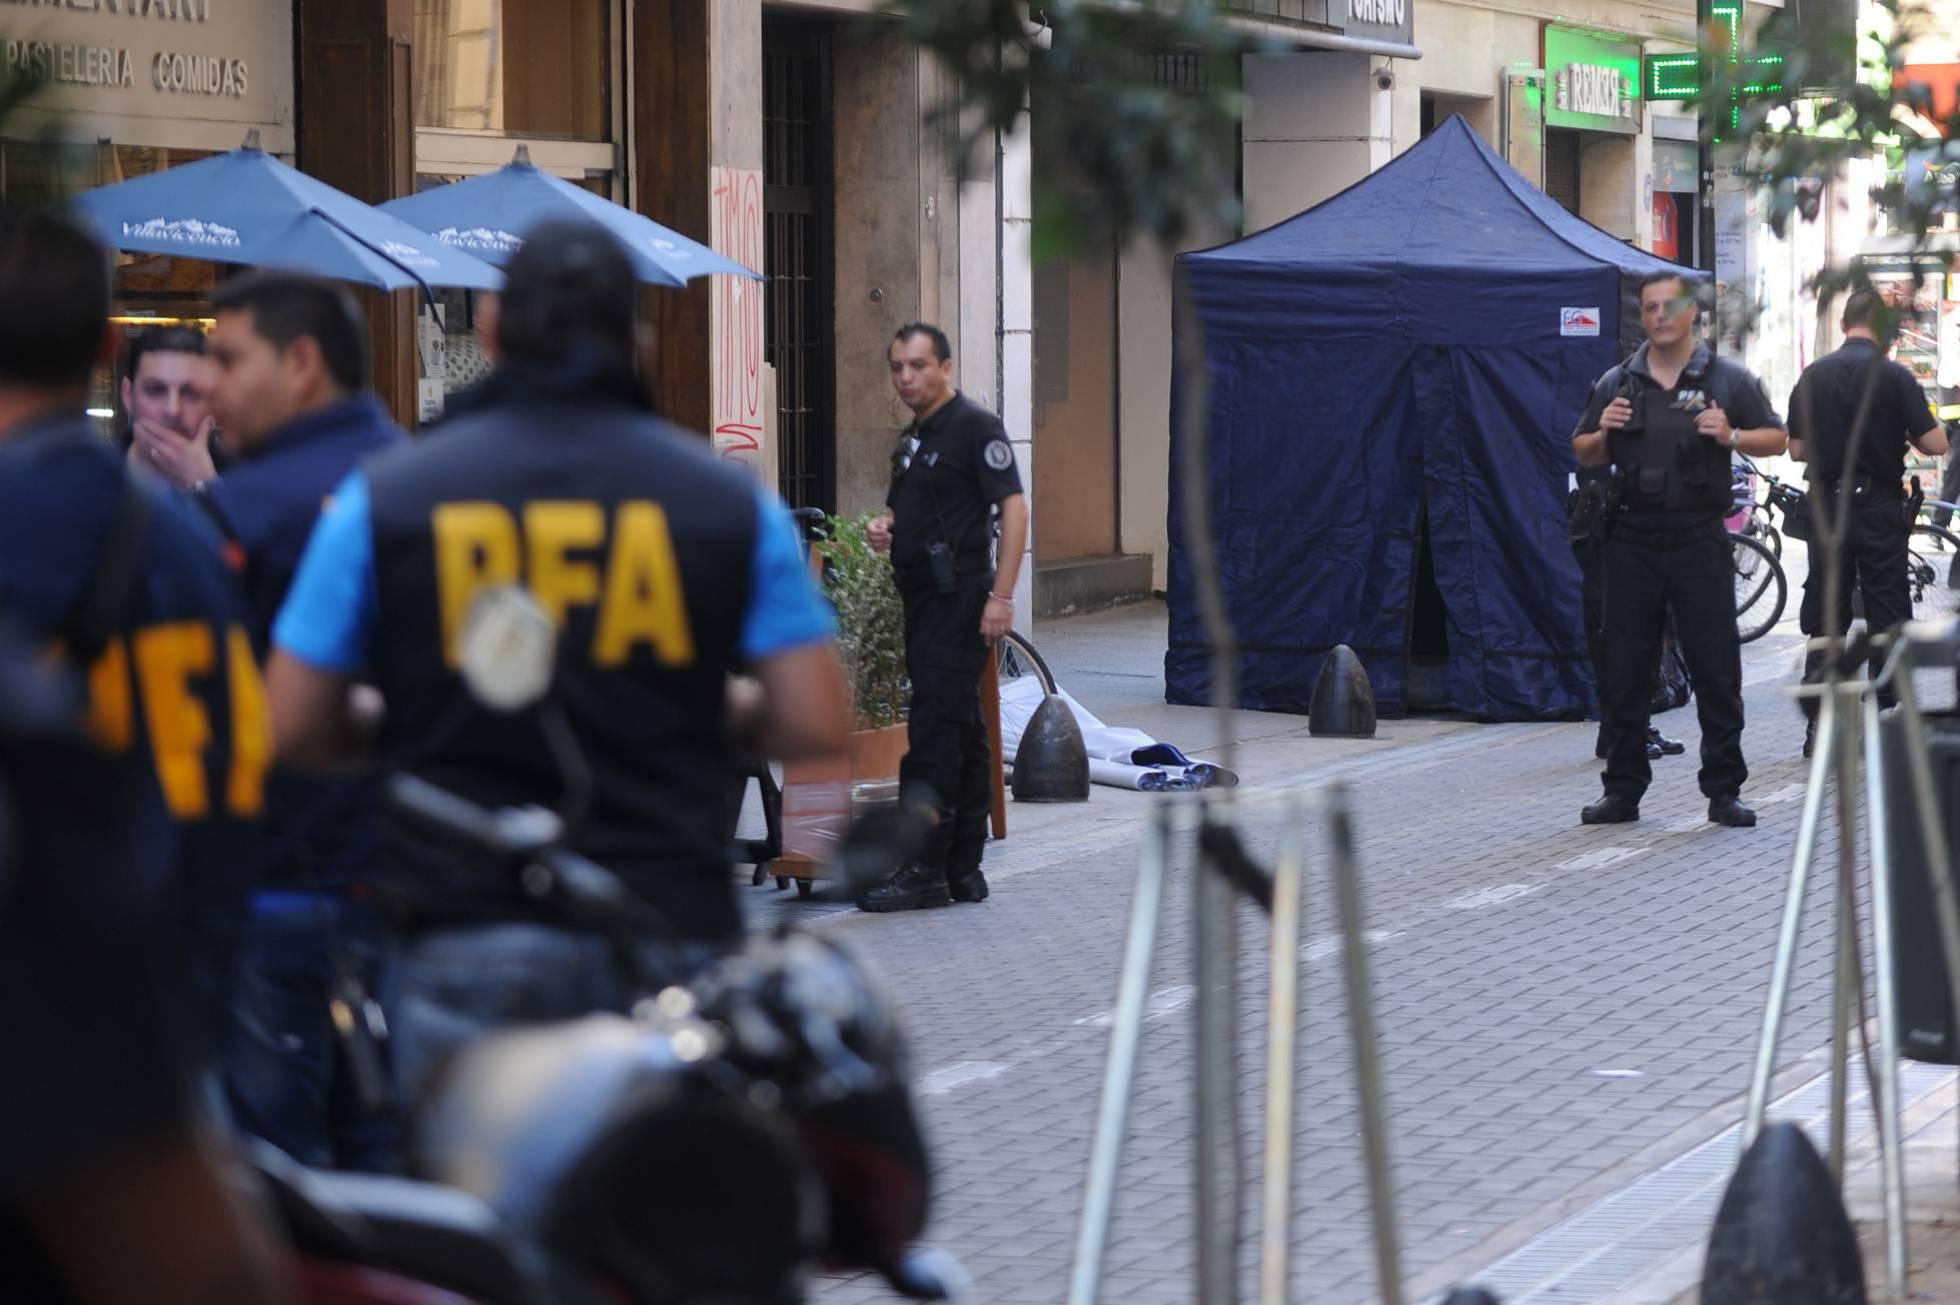 Argentina, terra de imigrantes, entra na guerra aos estrangeiros, por medo da insegurança